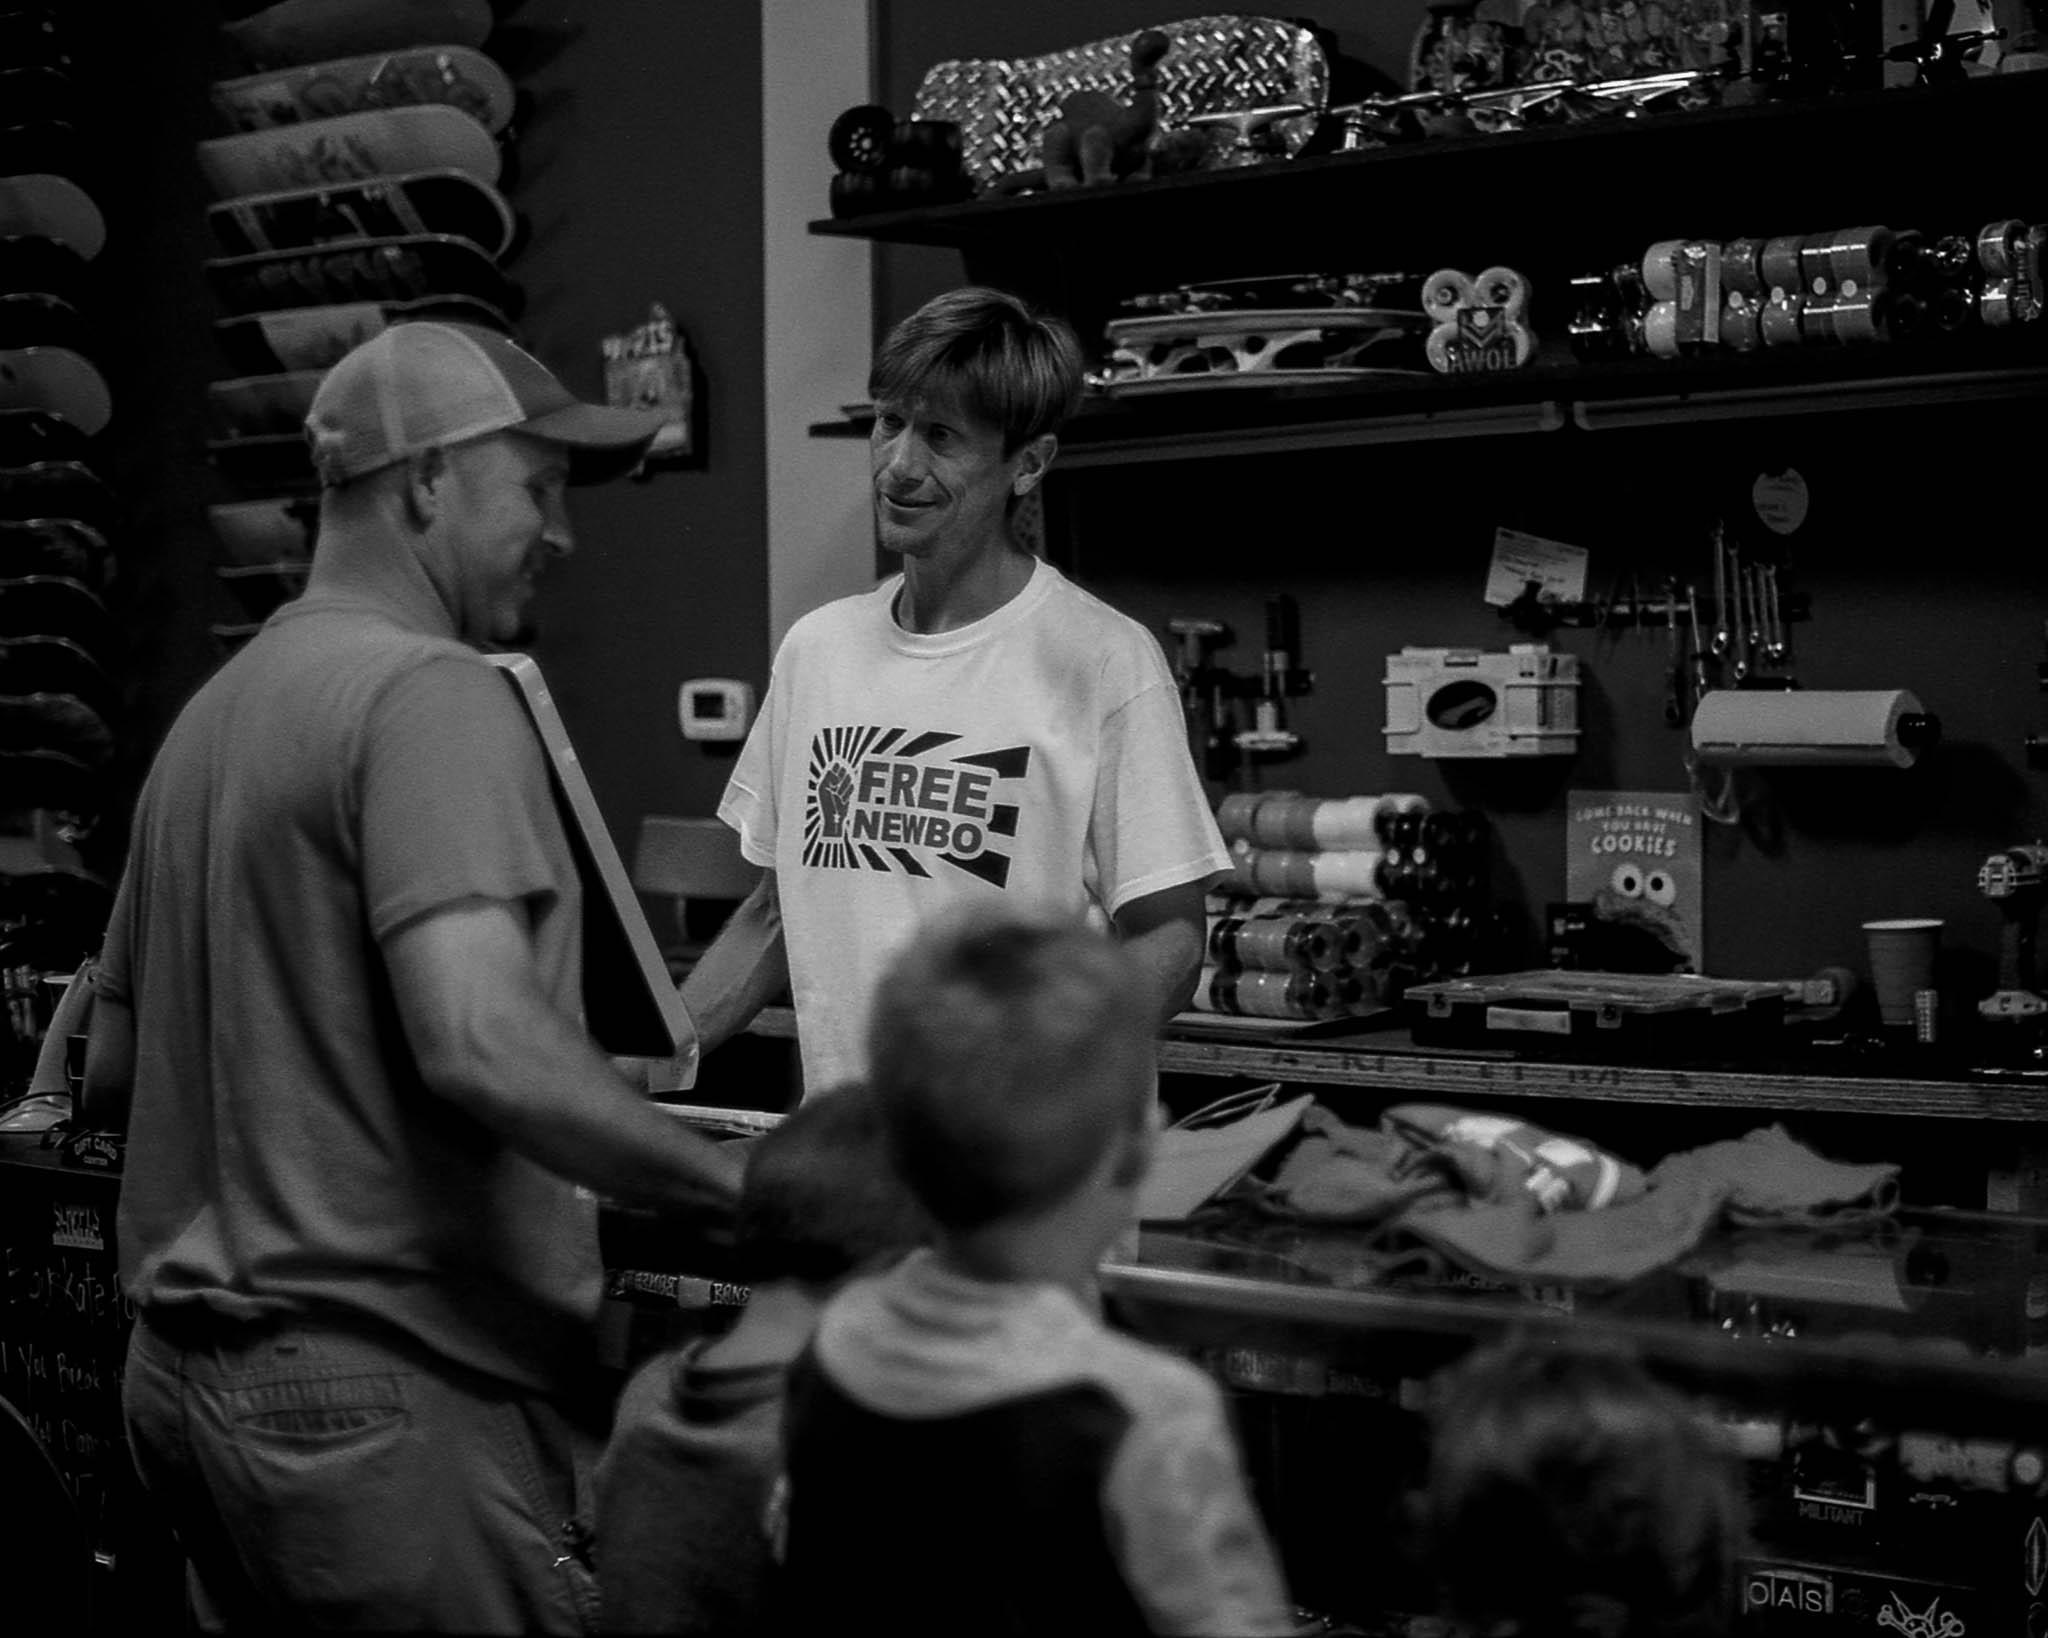 Nate talks to customers at his skateshop, Eduskate